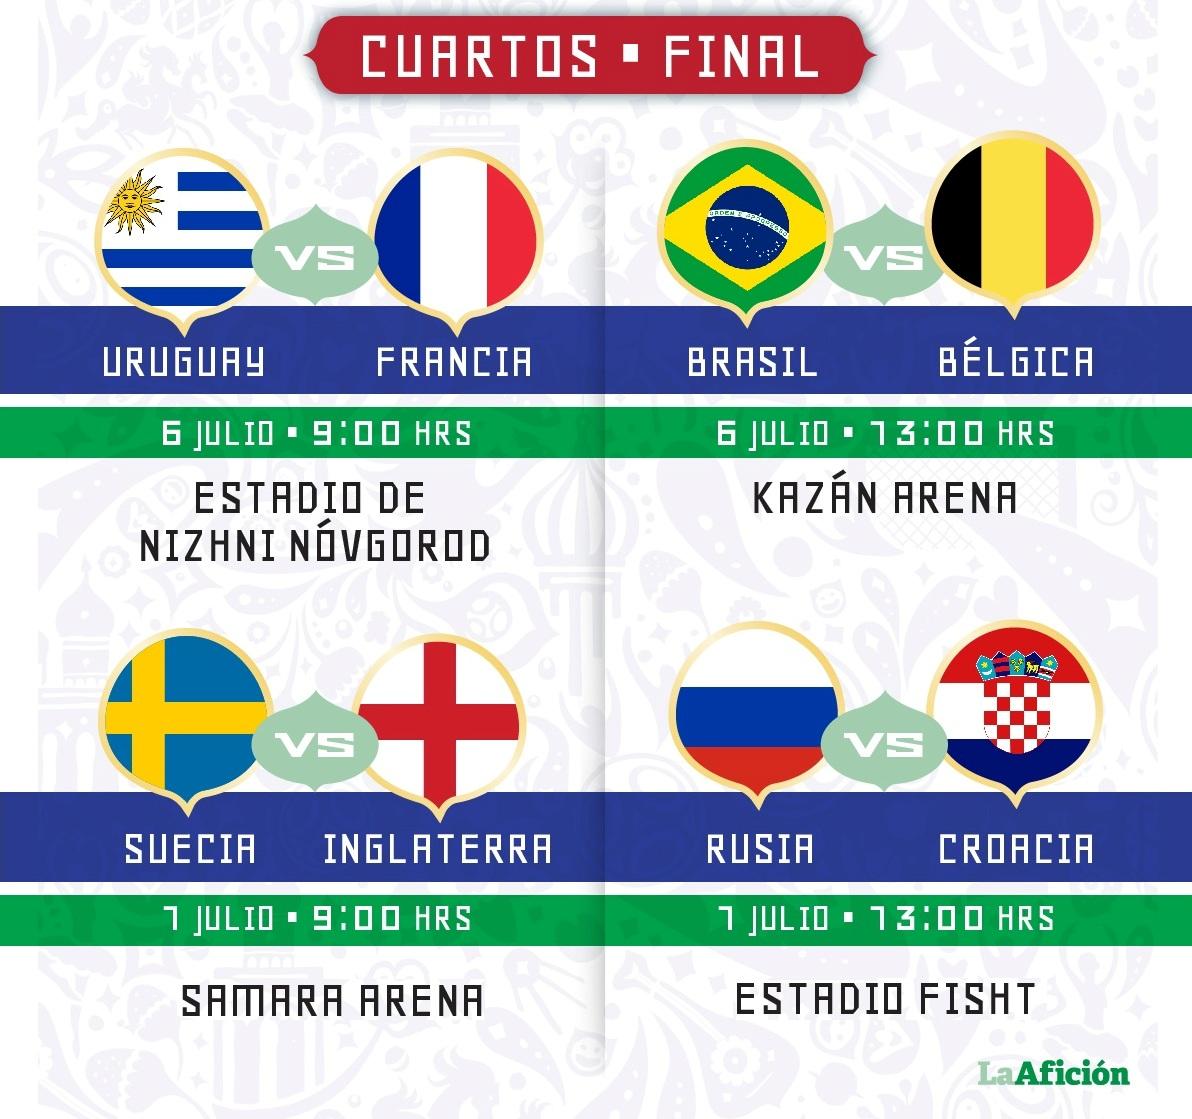 Cuartos de final mundial 2018 fechas horario y d nde ver for Euroliga cuartos de final